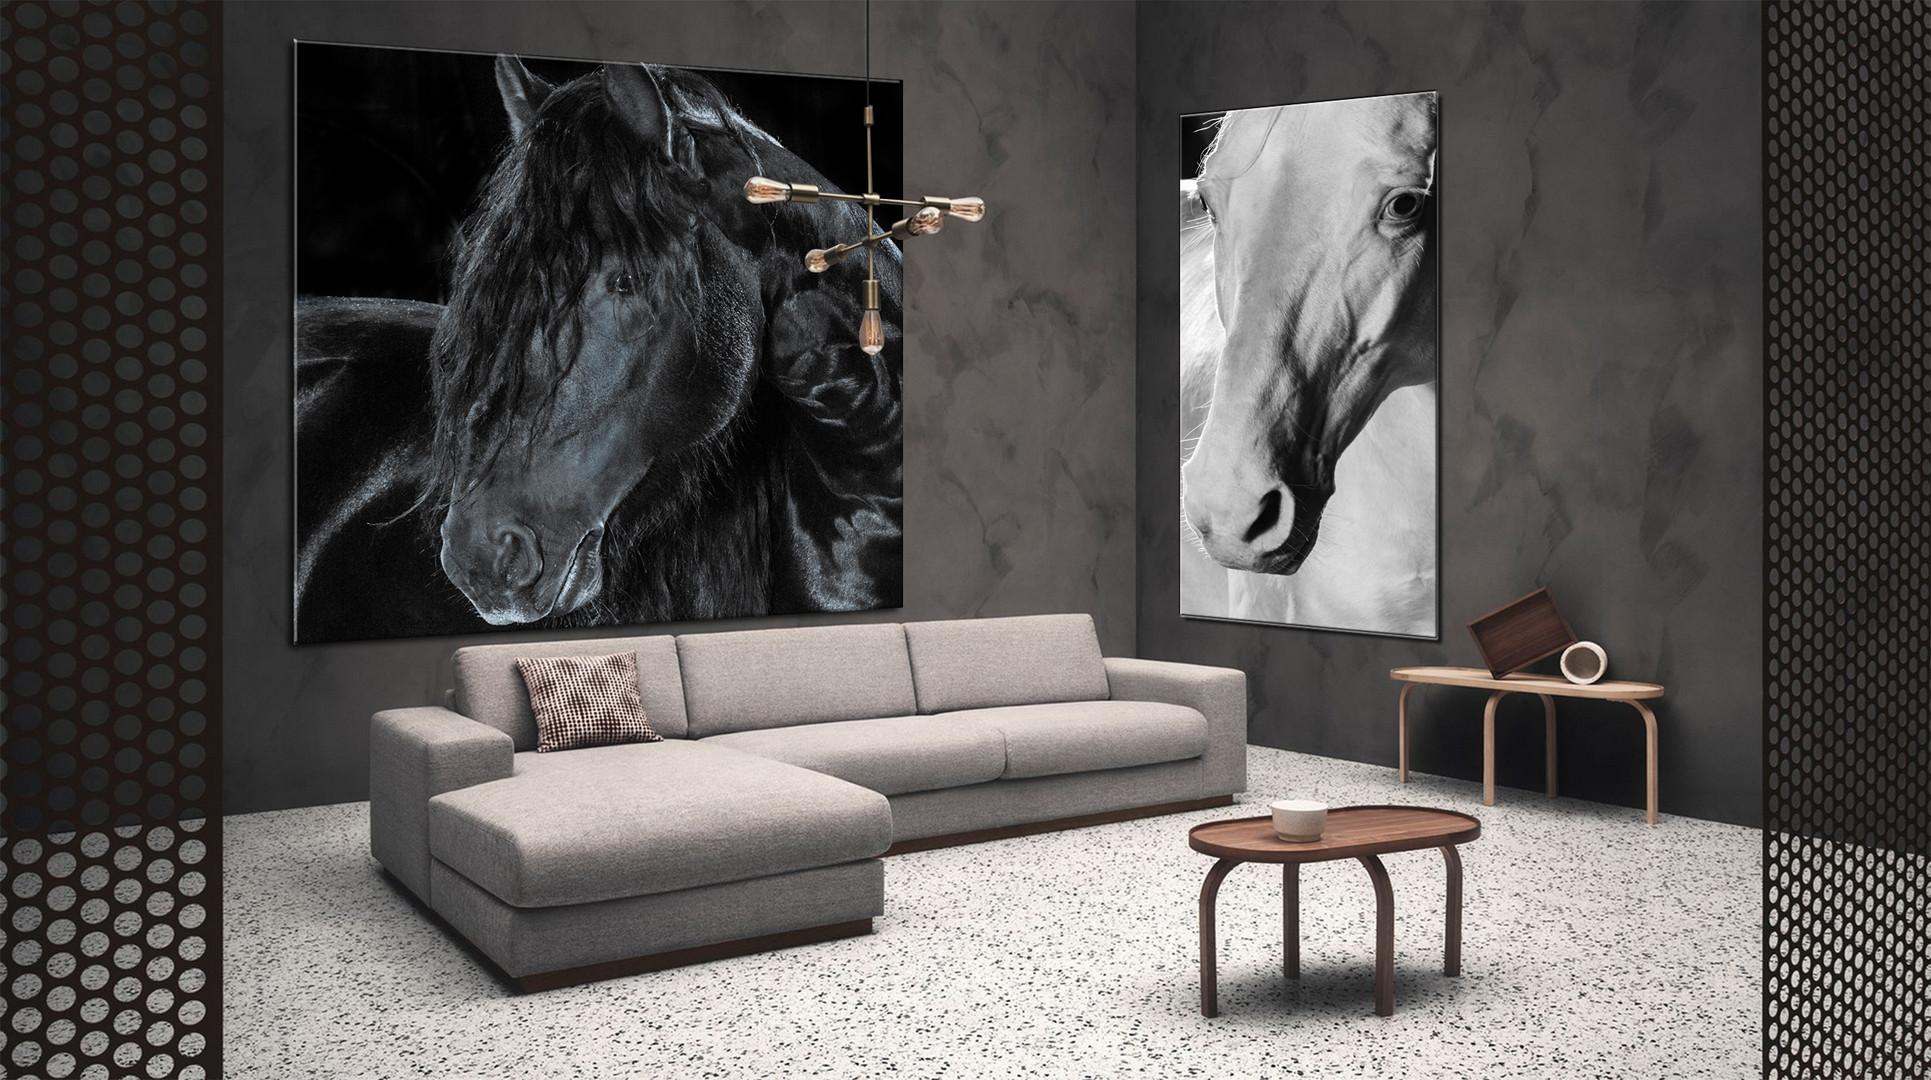 Frison black & white